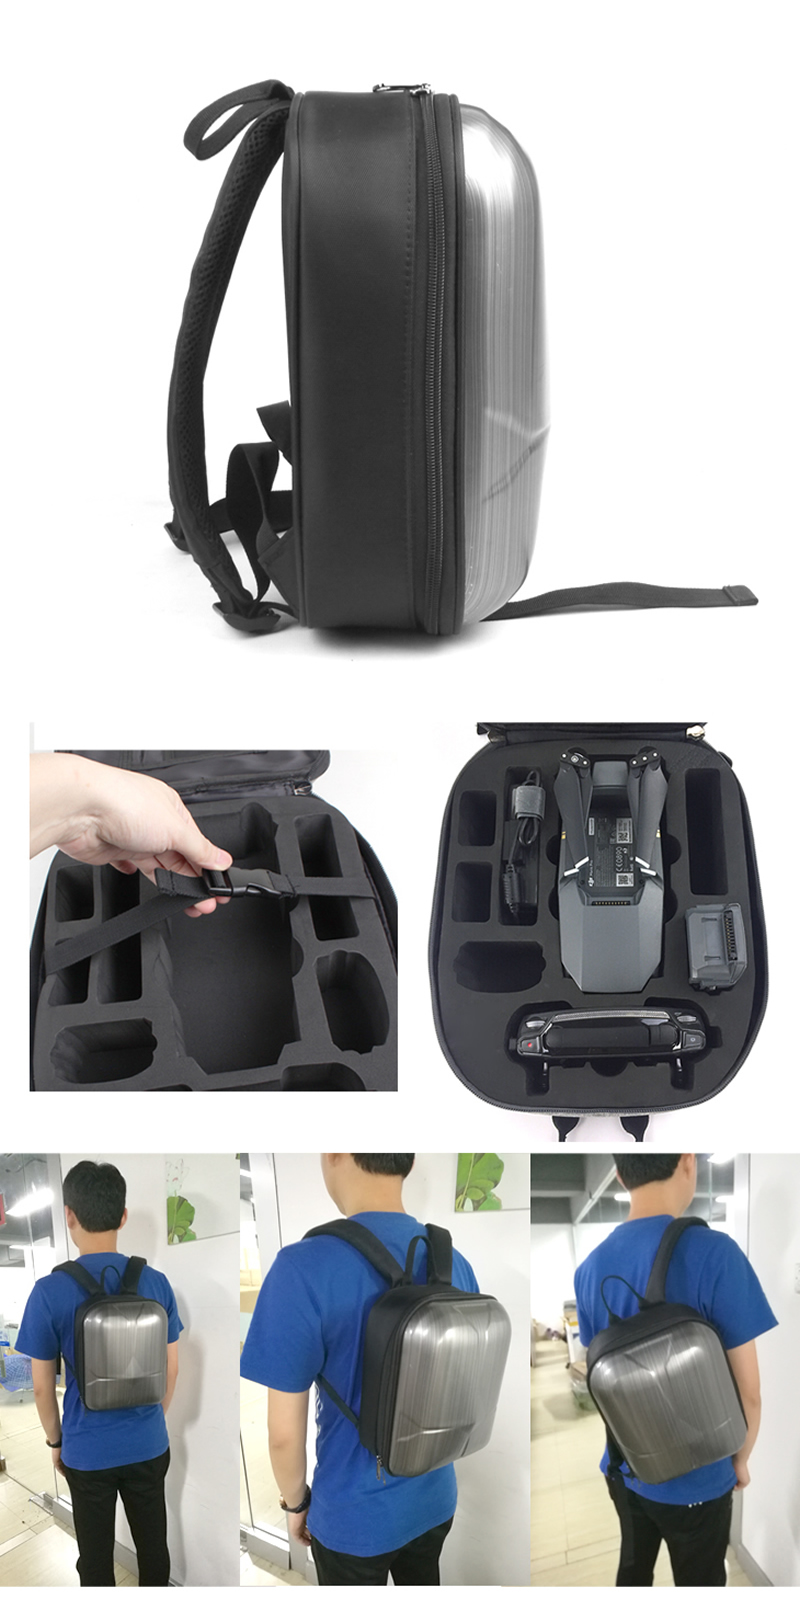 DJI Mavic Pro PC Hard Shell Backpack Drone Mini Travel Case Storage Waterproof Shoulder Bag Accessories Carrying Bag Quadcopter